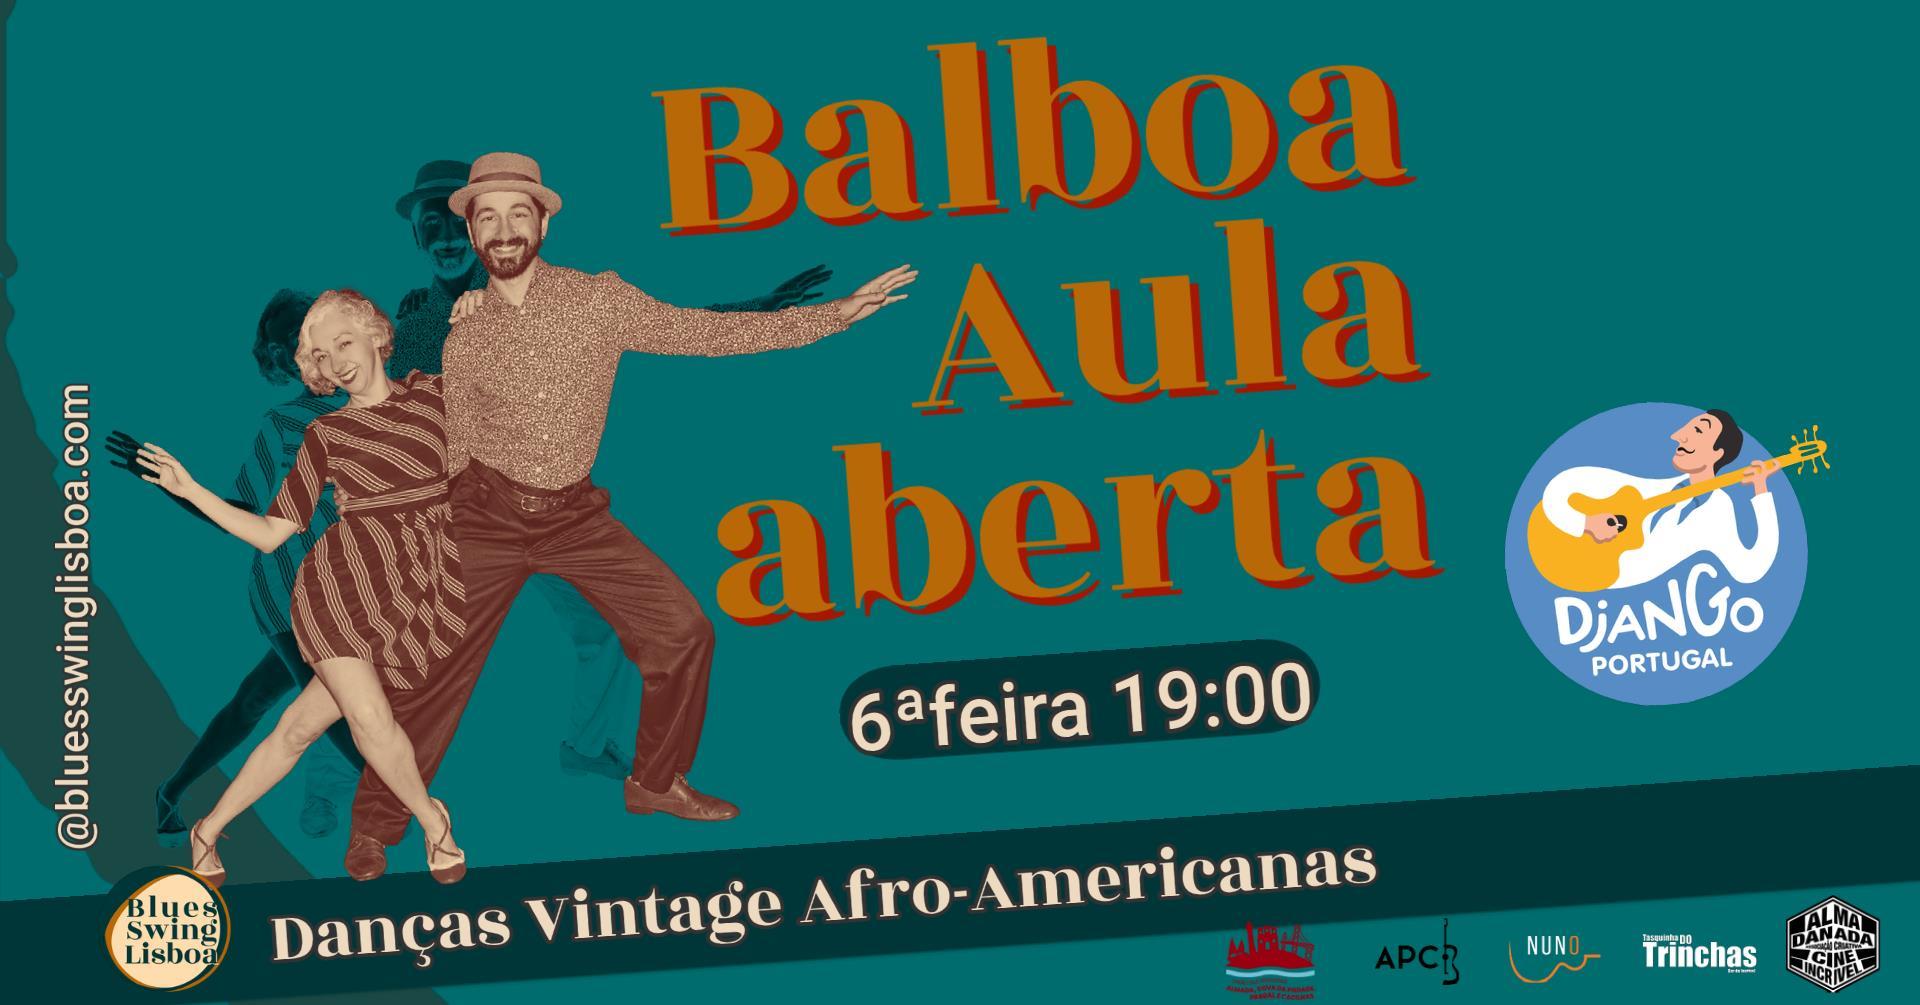 Balboa aula aberta | Festival Django Portugal